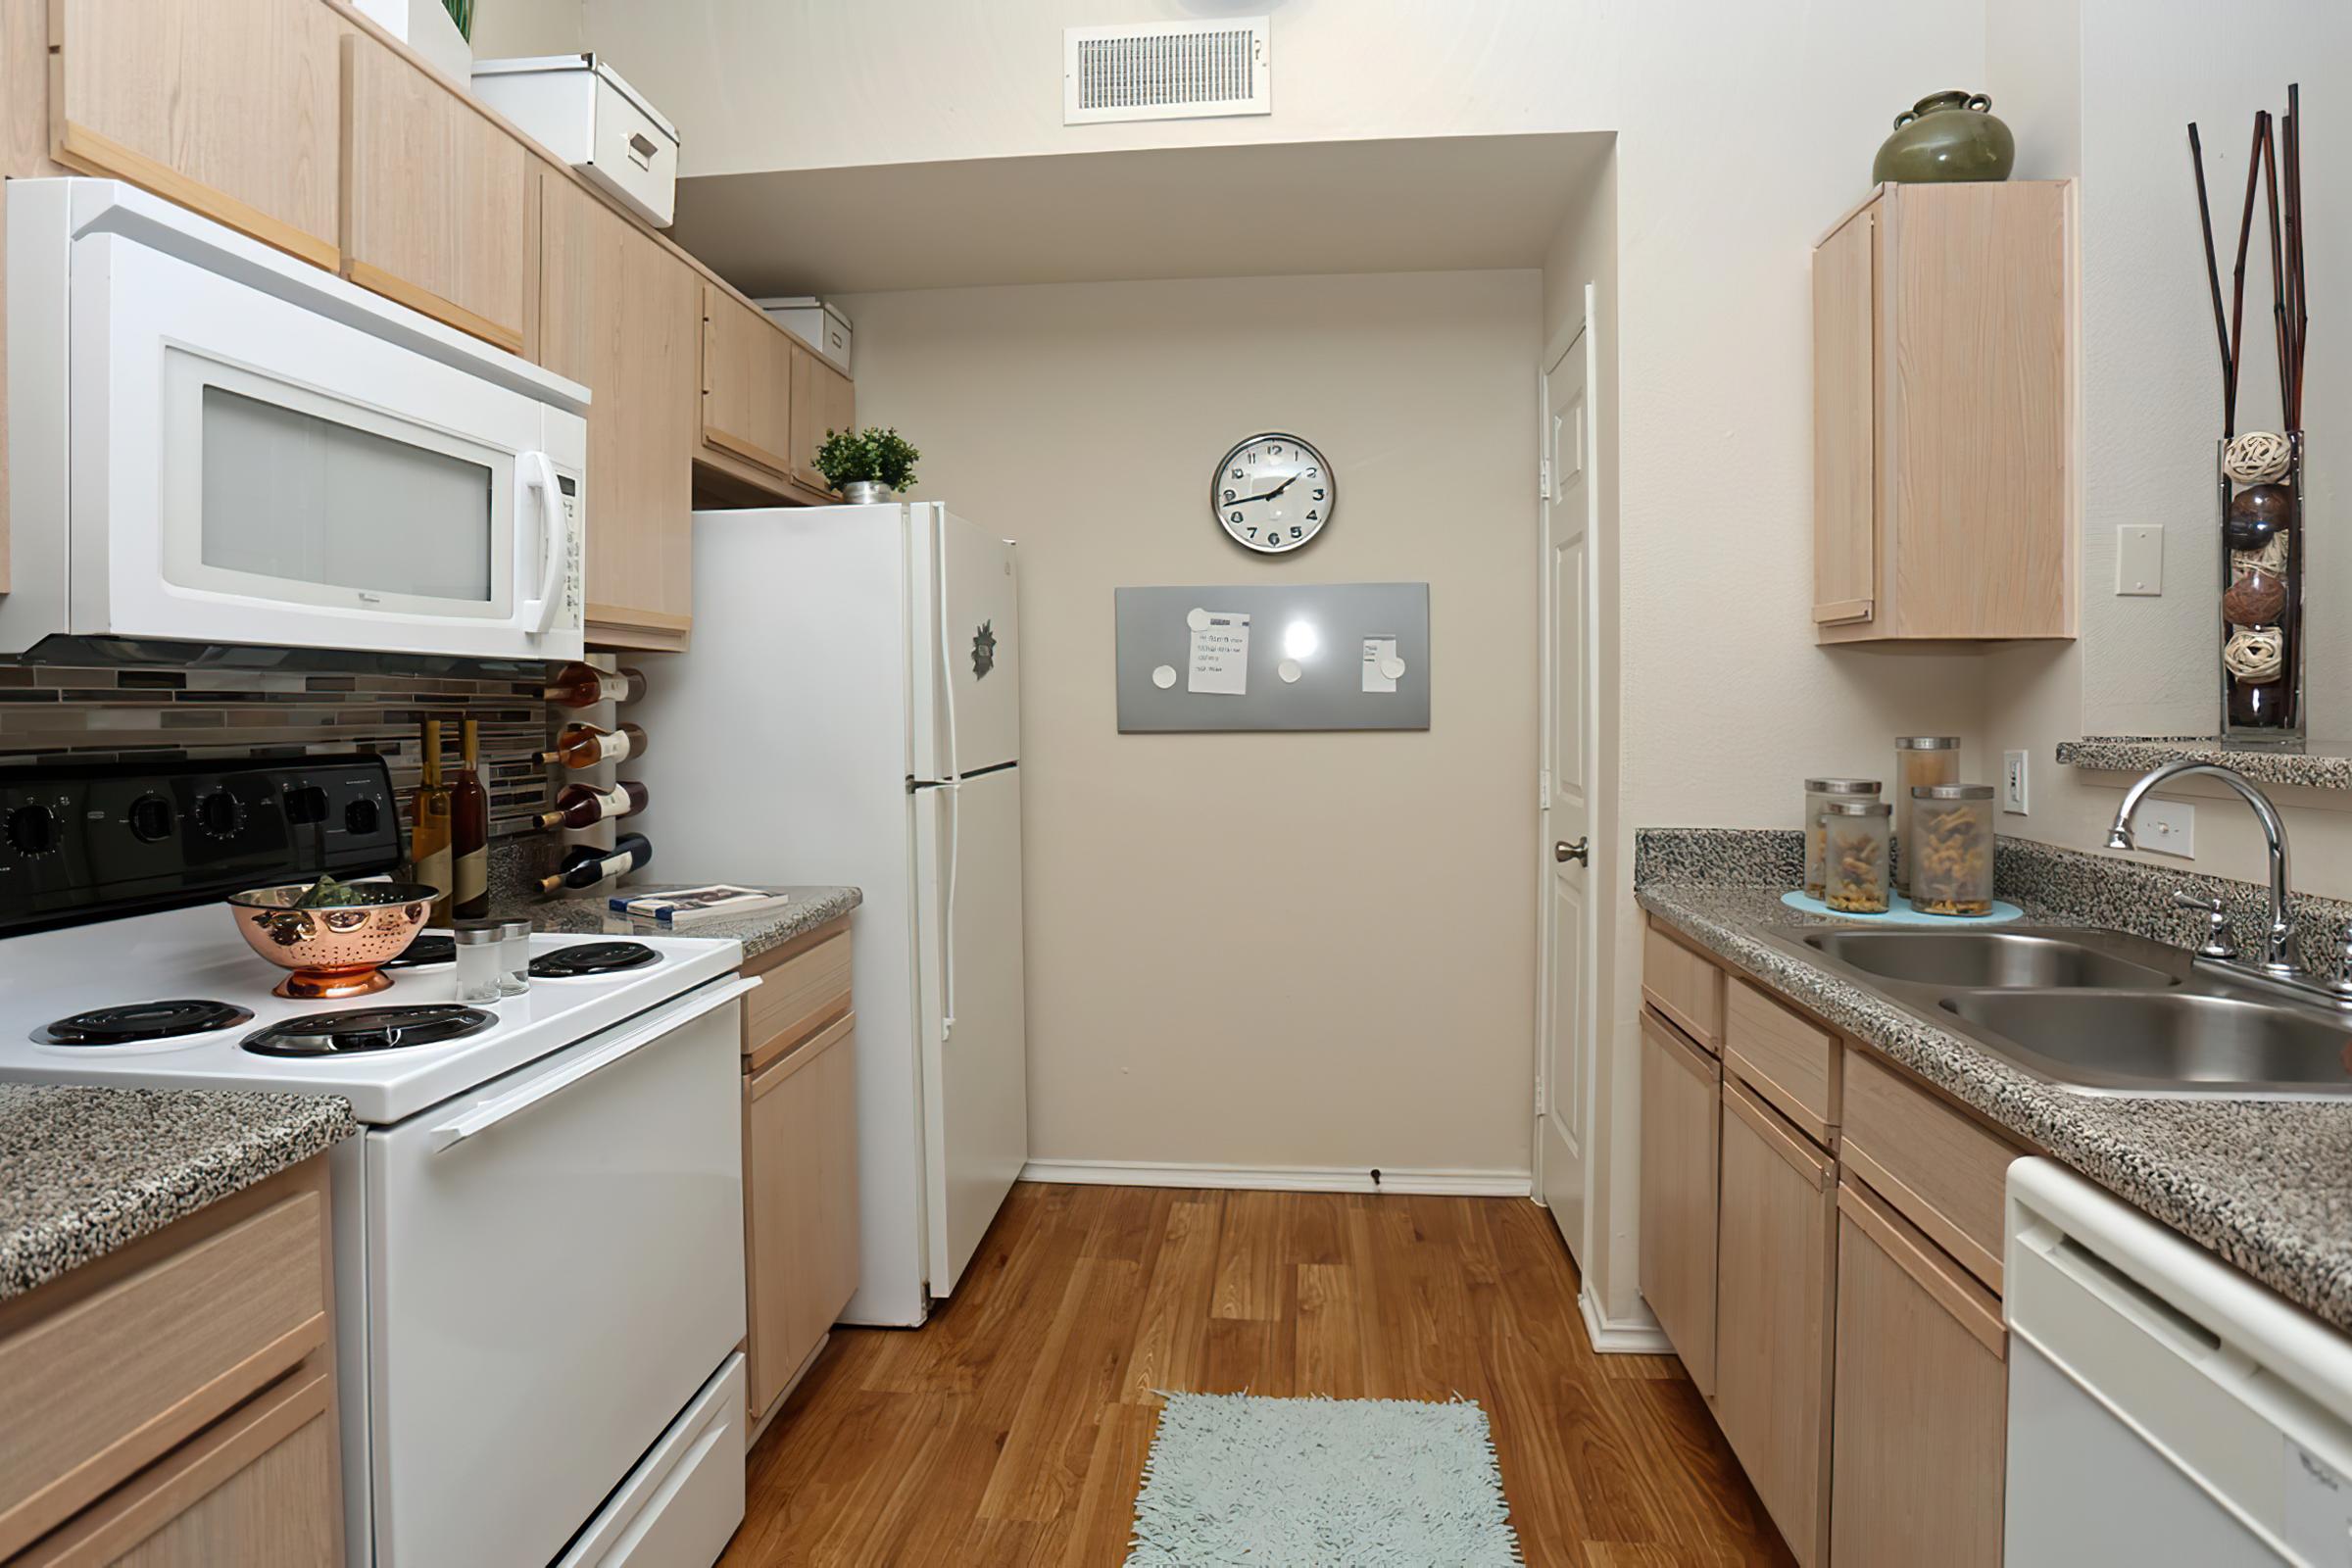 kitchen2x2-width-2400px.png